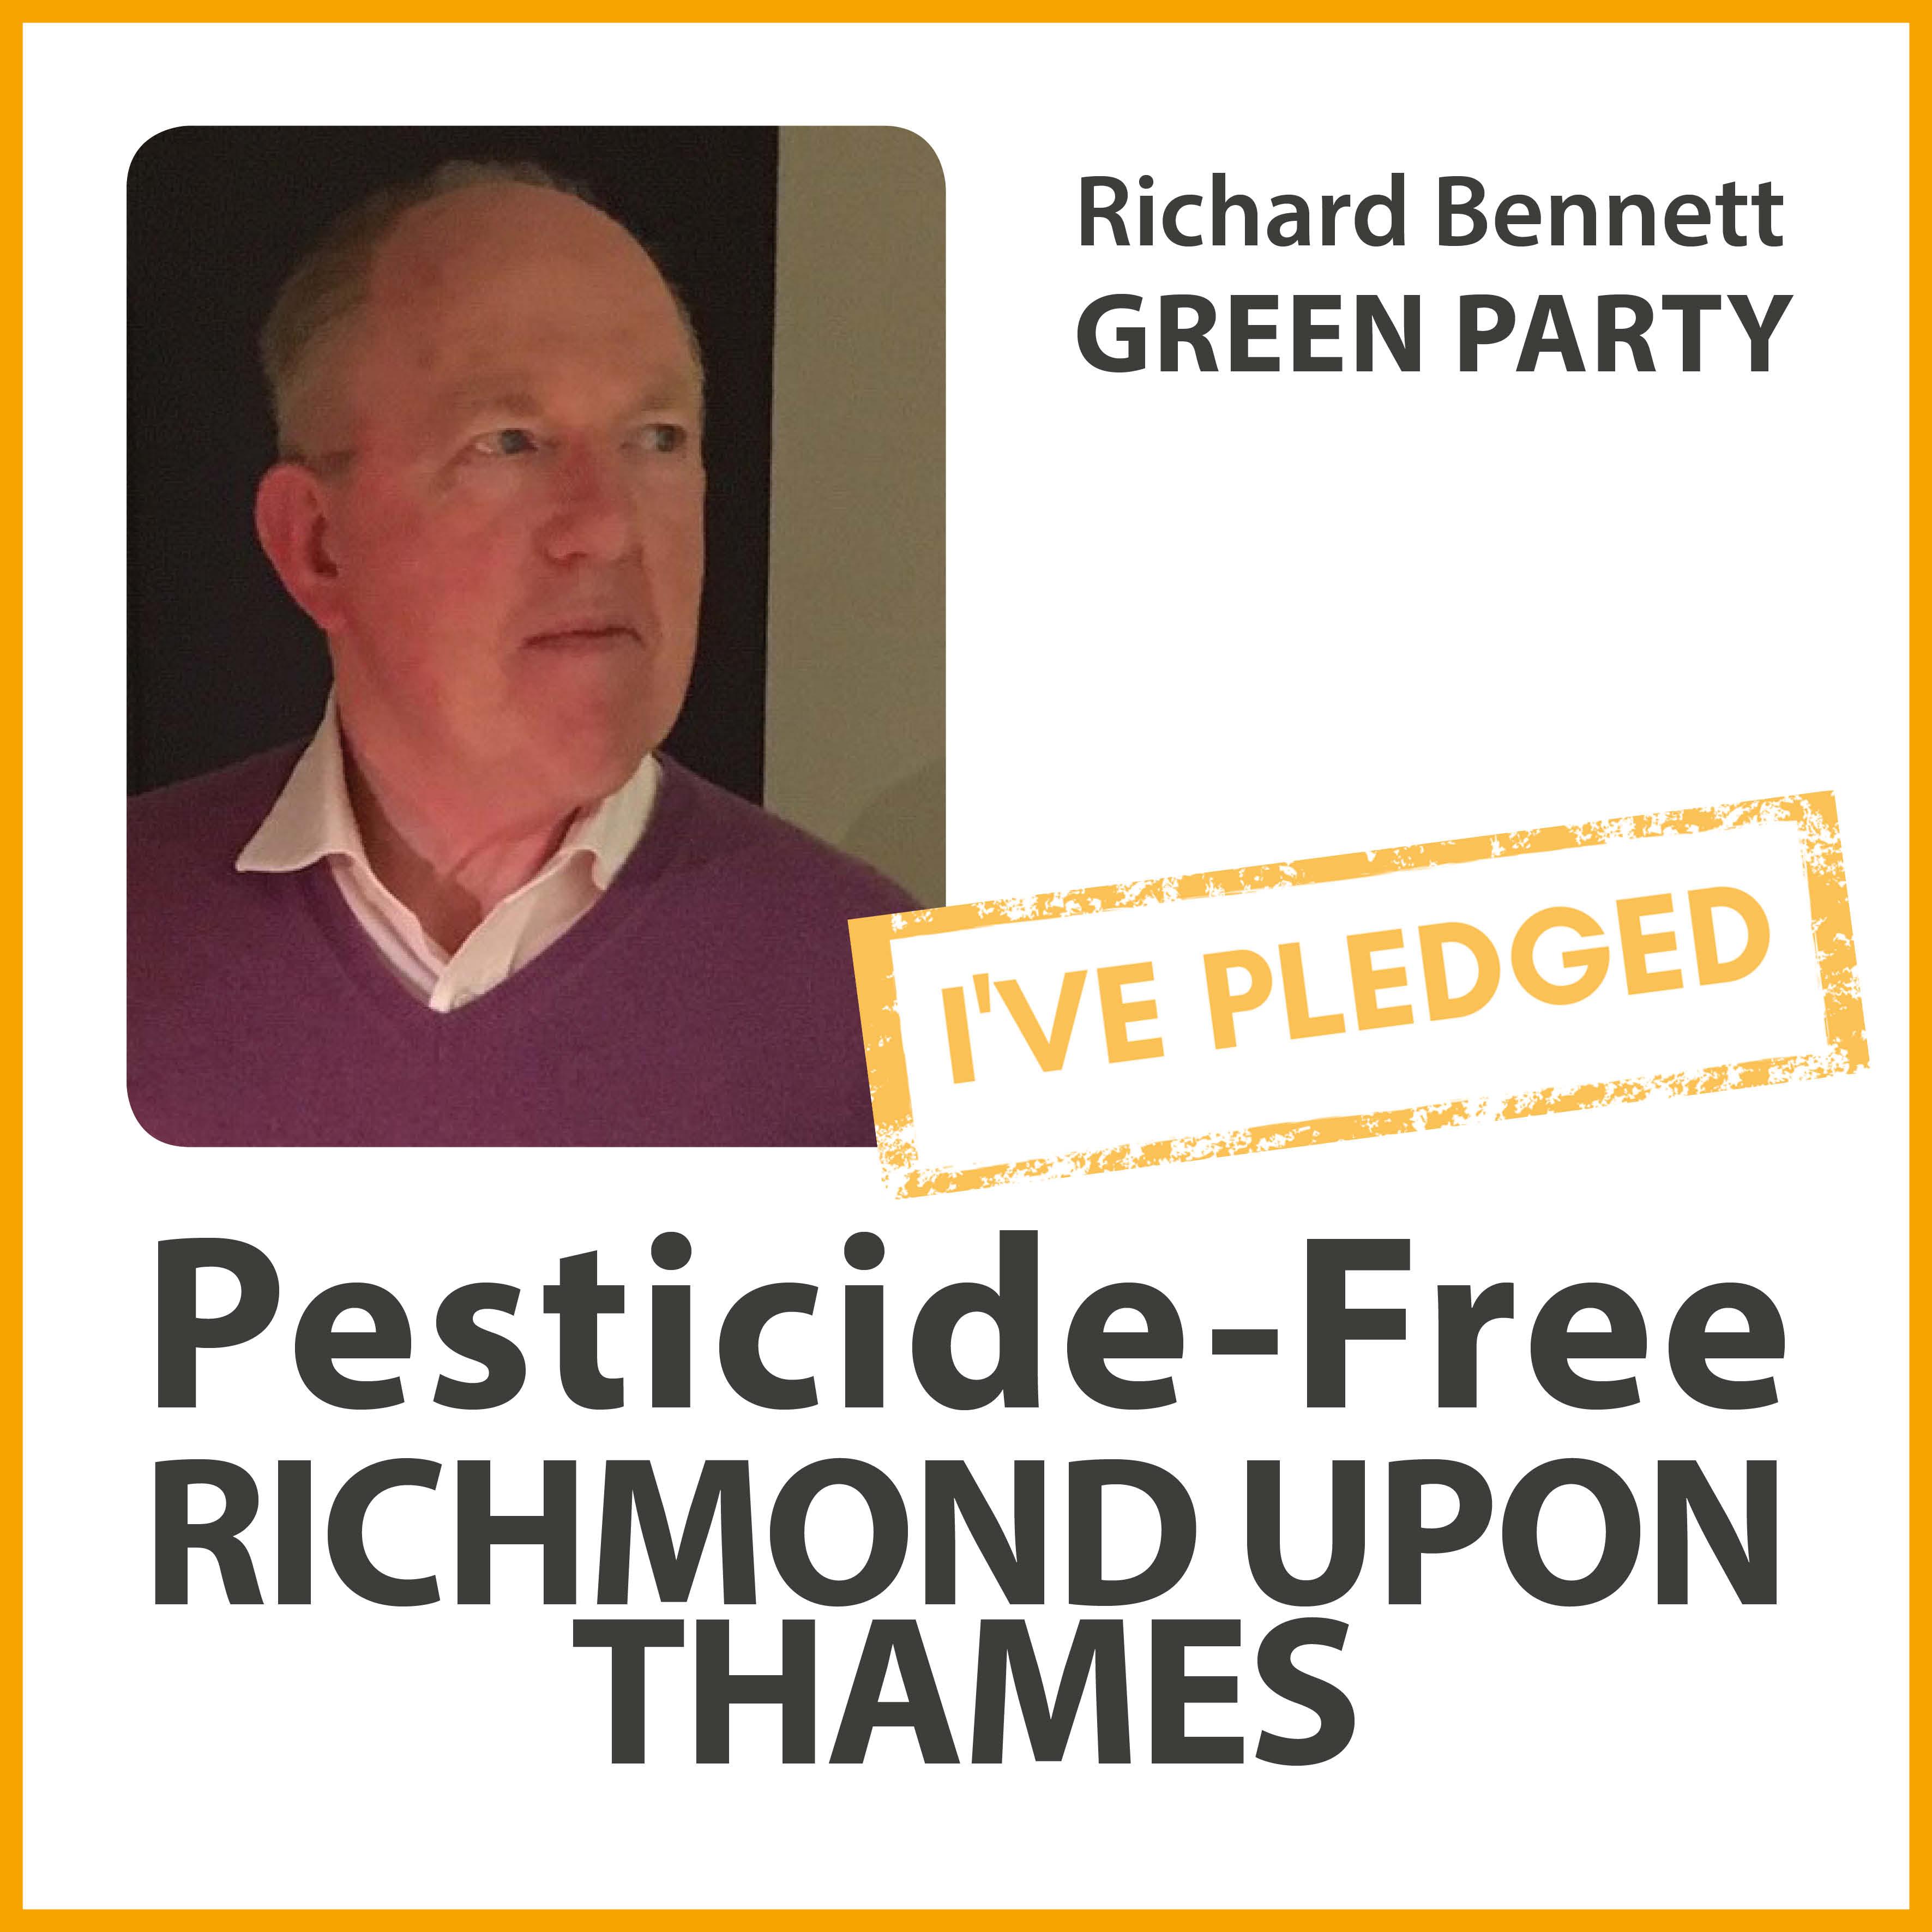 Richard Bennett has pledged to make Richmond pesticide-free